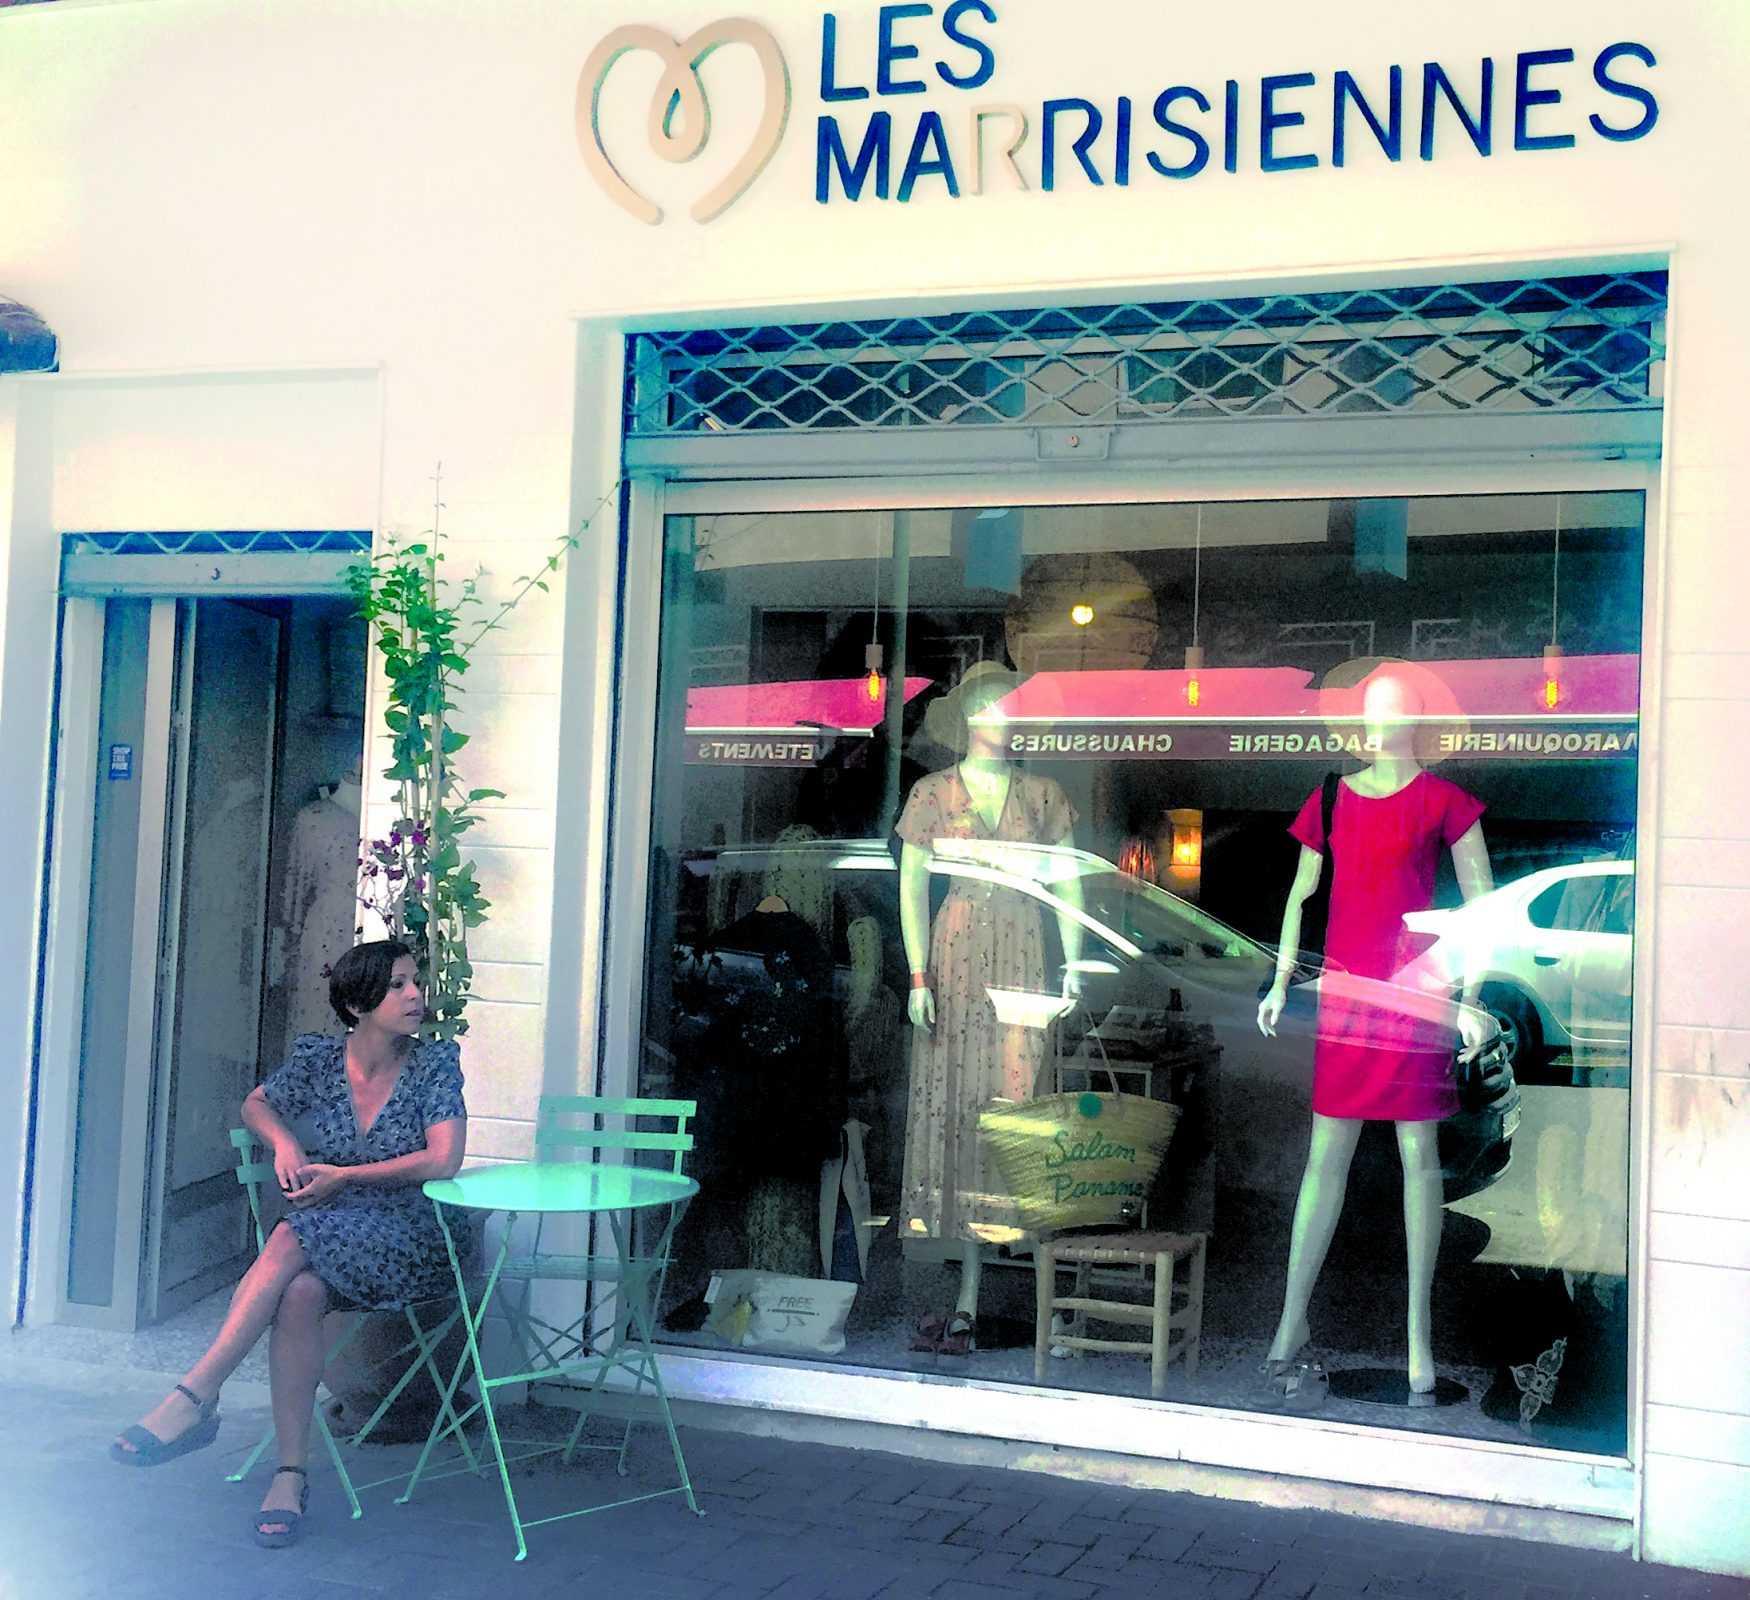 Les Marrisiennes une adresse trendy